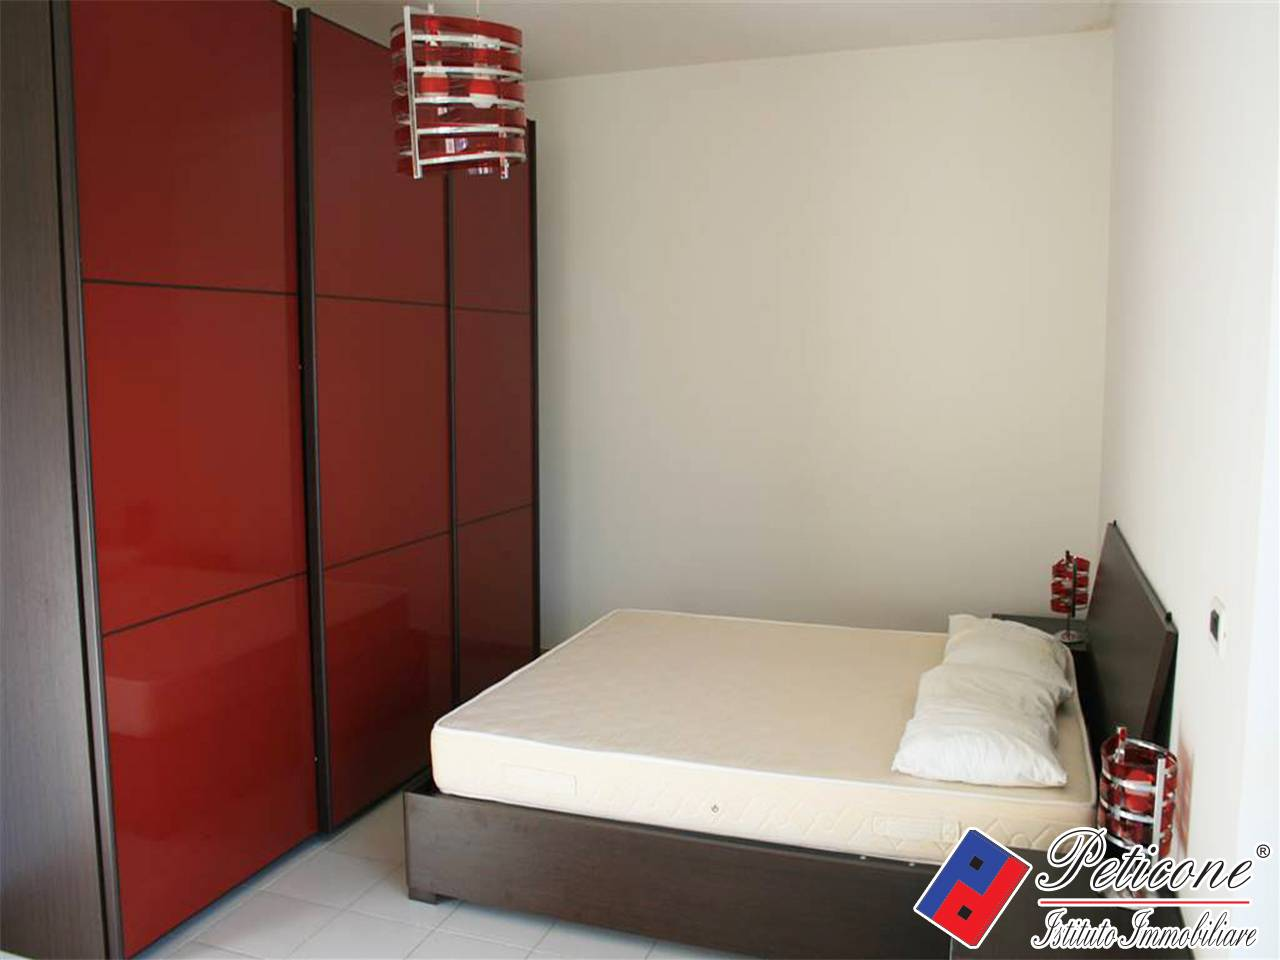 Appartamento in Vendita a Gaeta: 4 locali, 91 mq - Foto 5